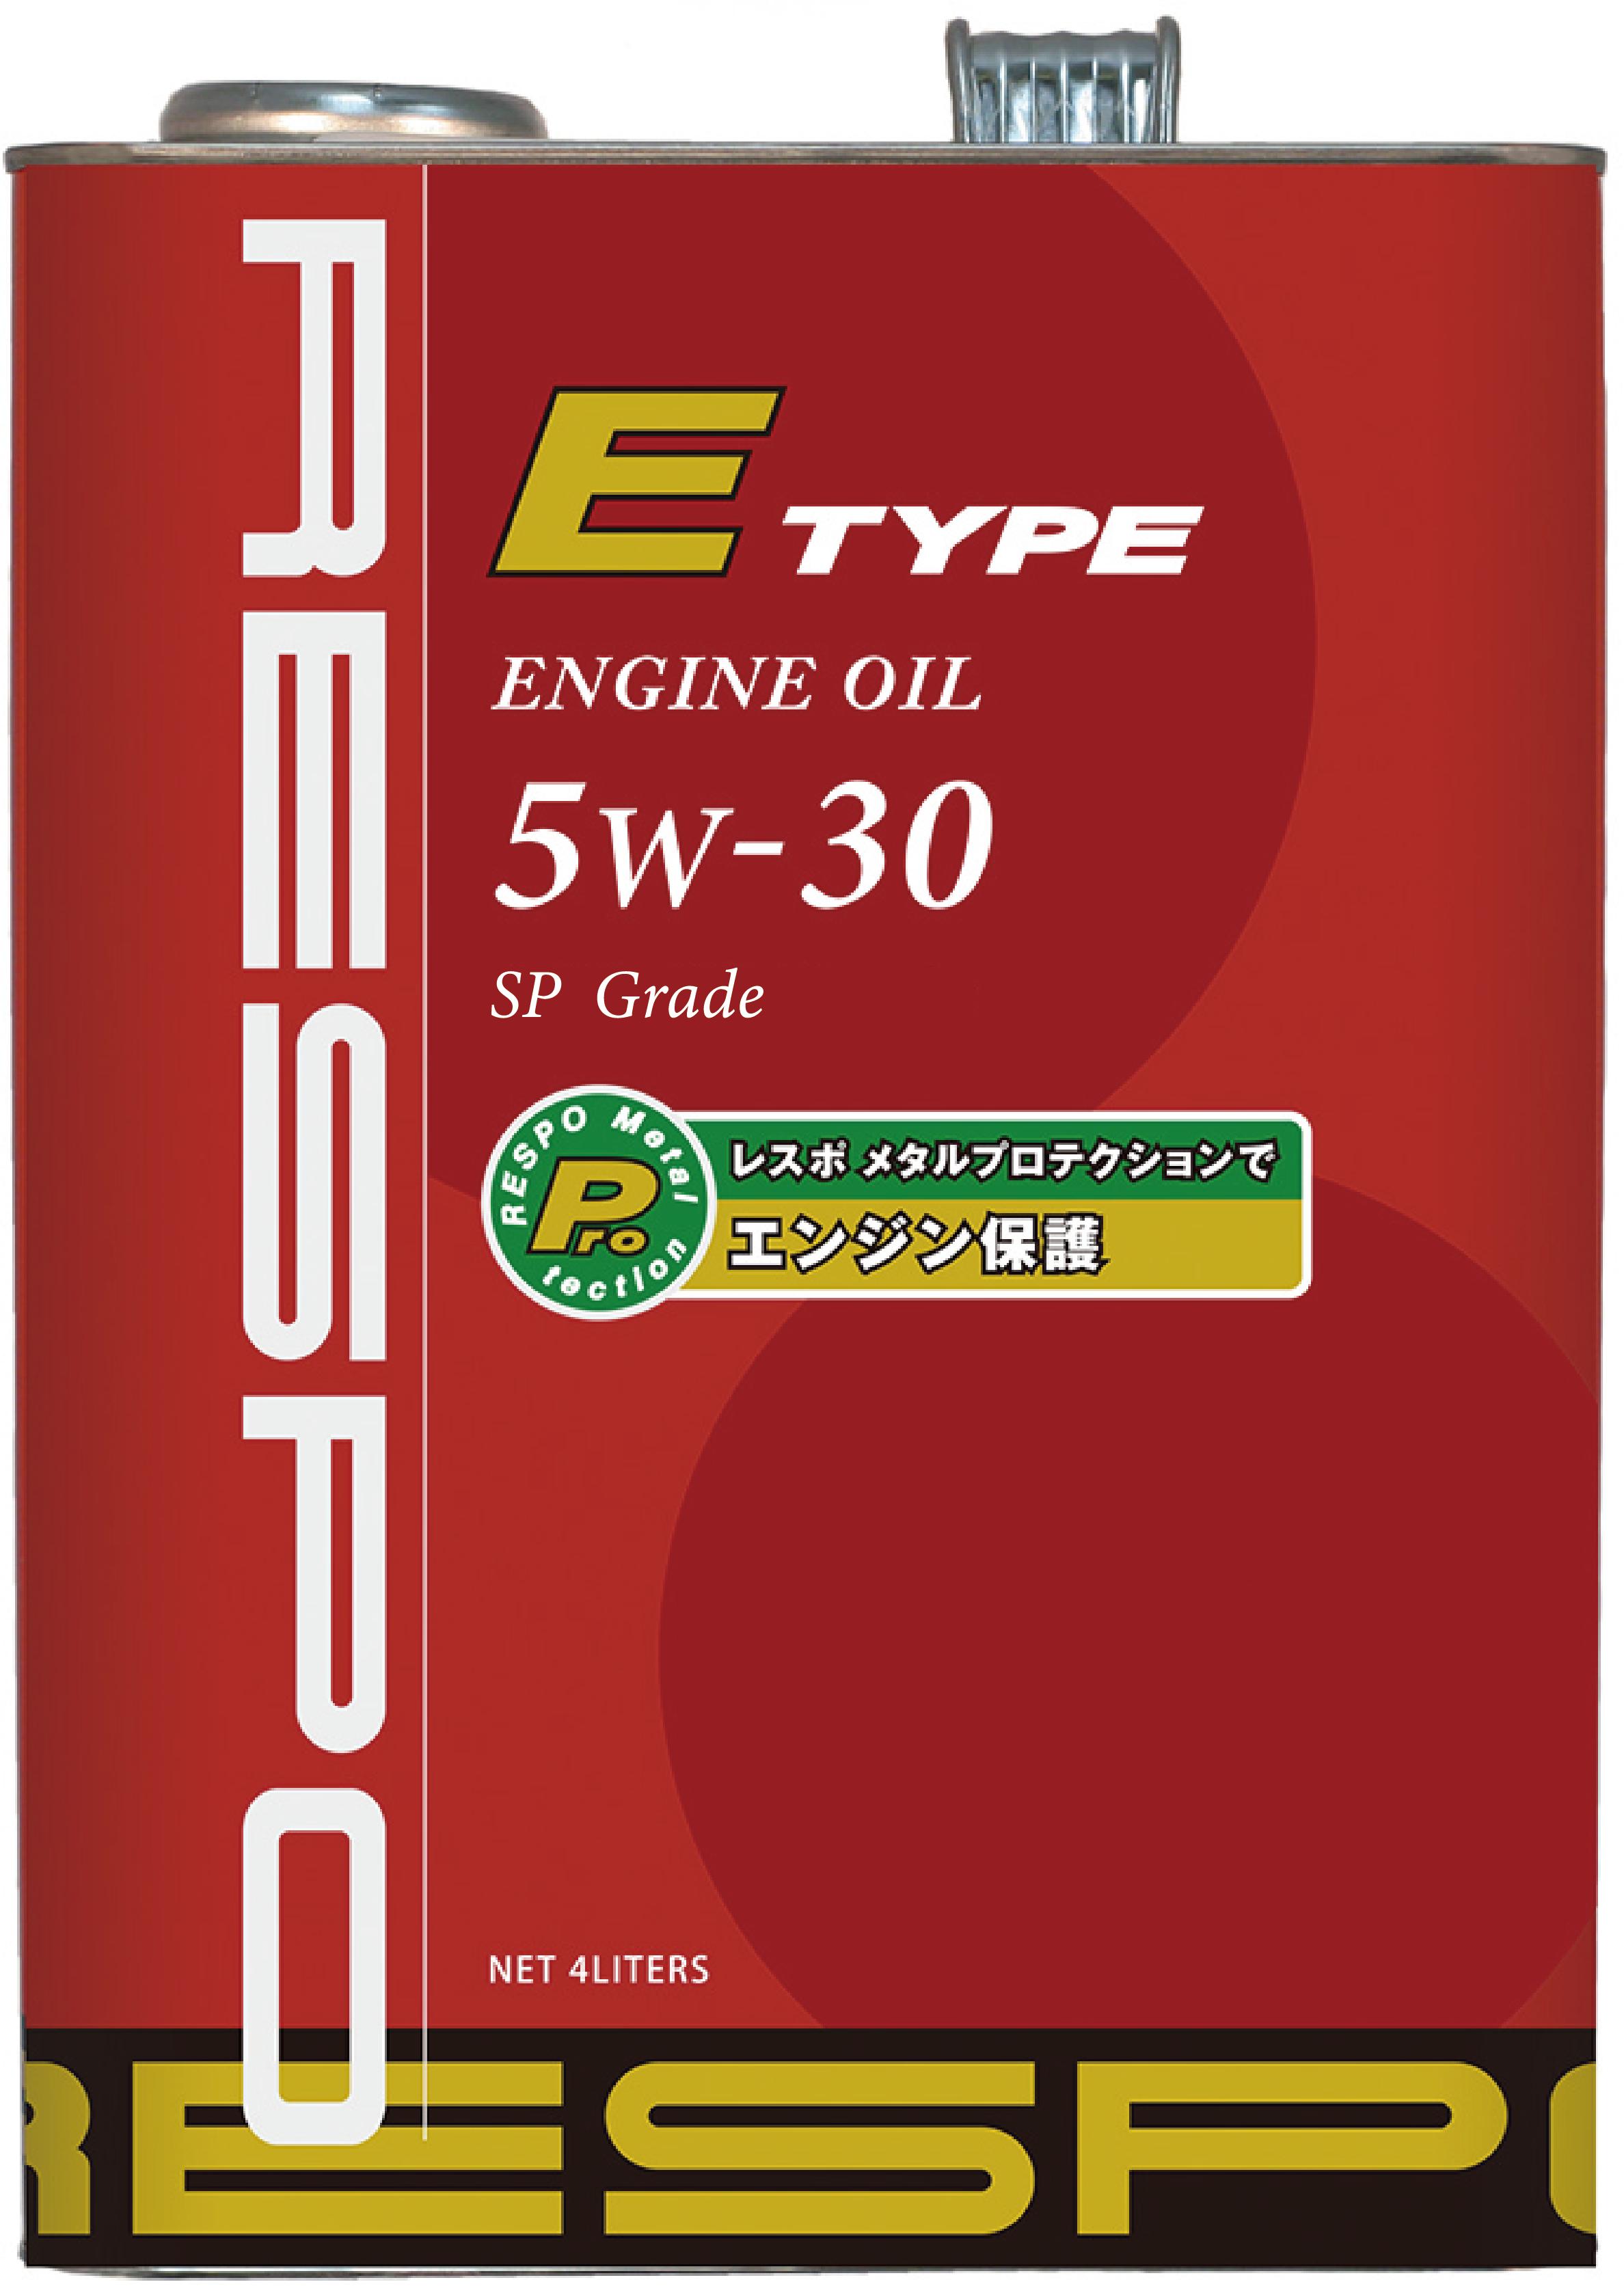 E TYPE 5w-30